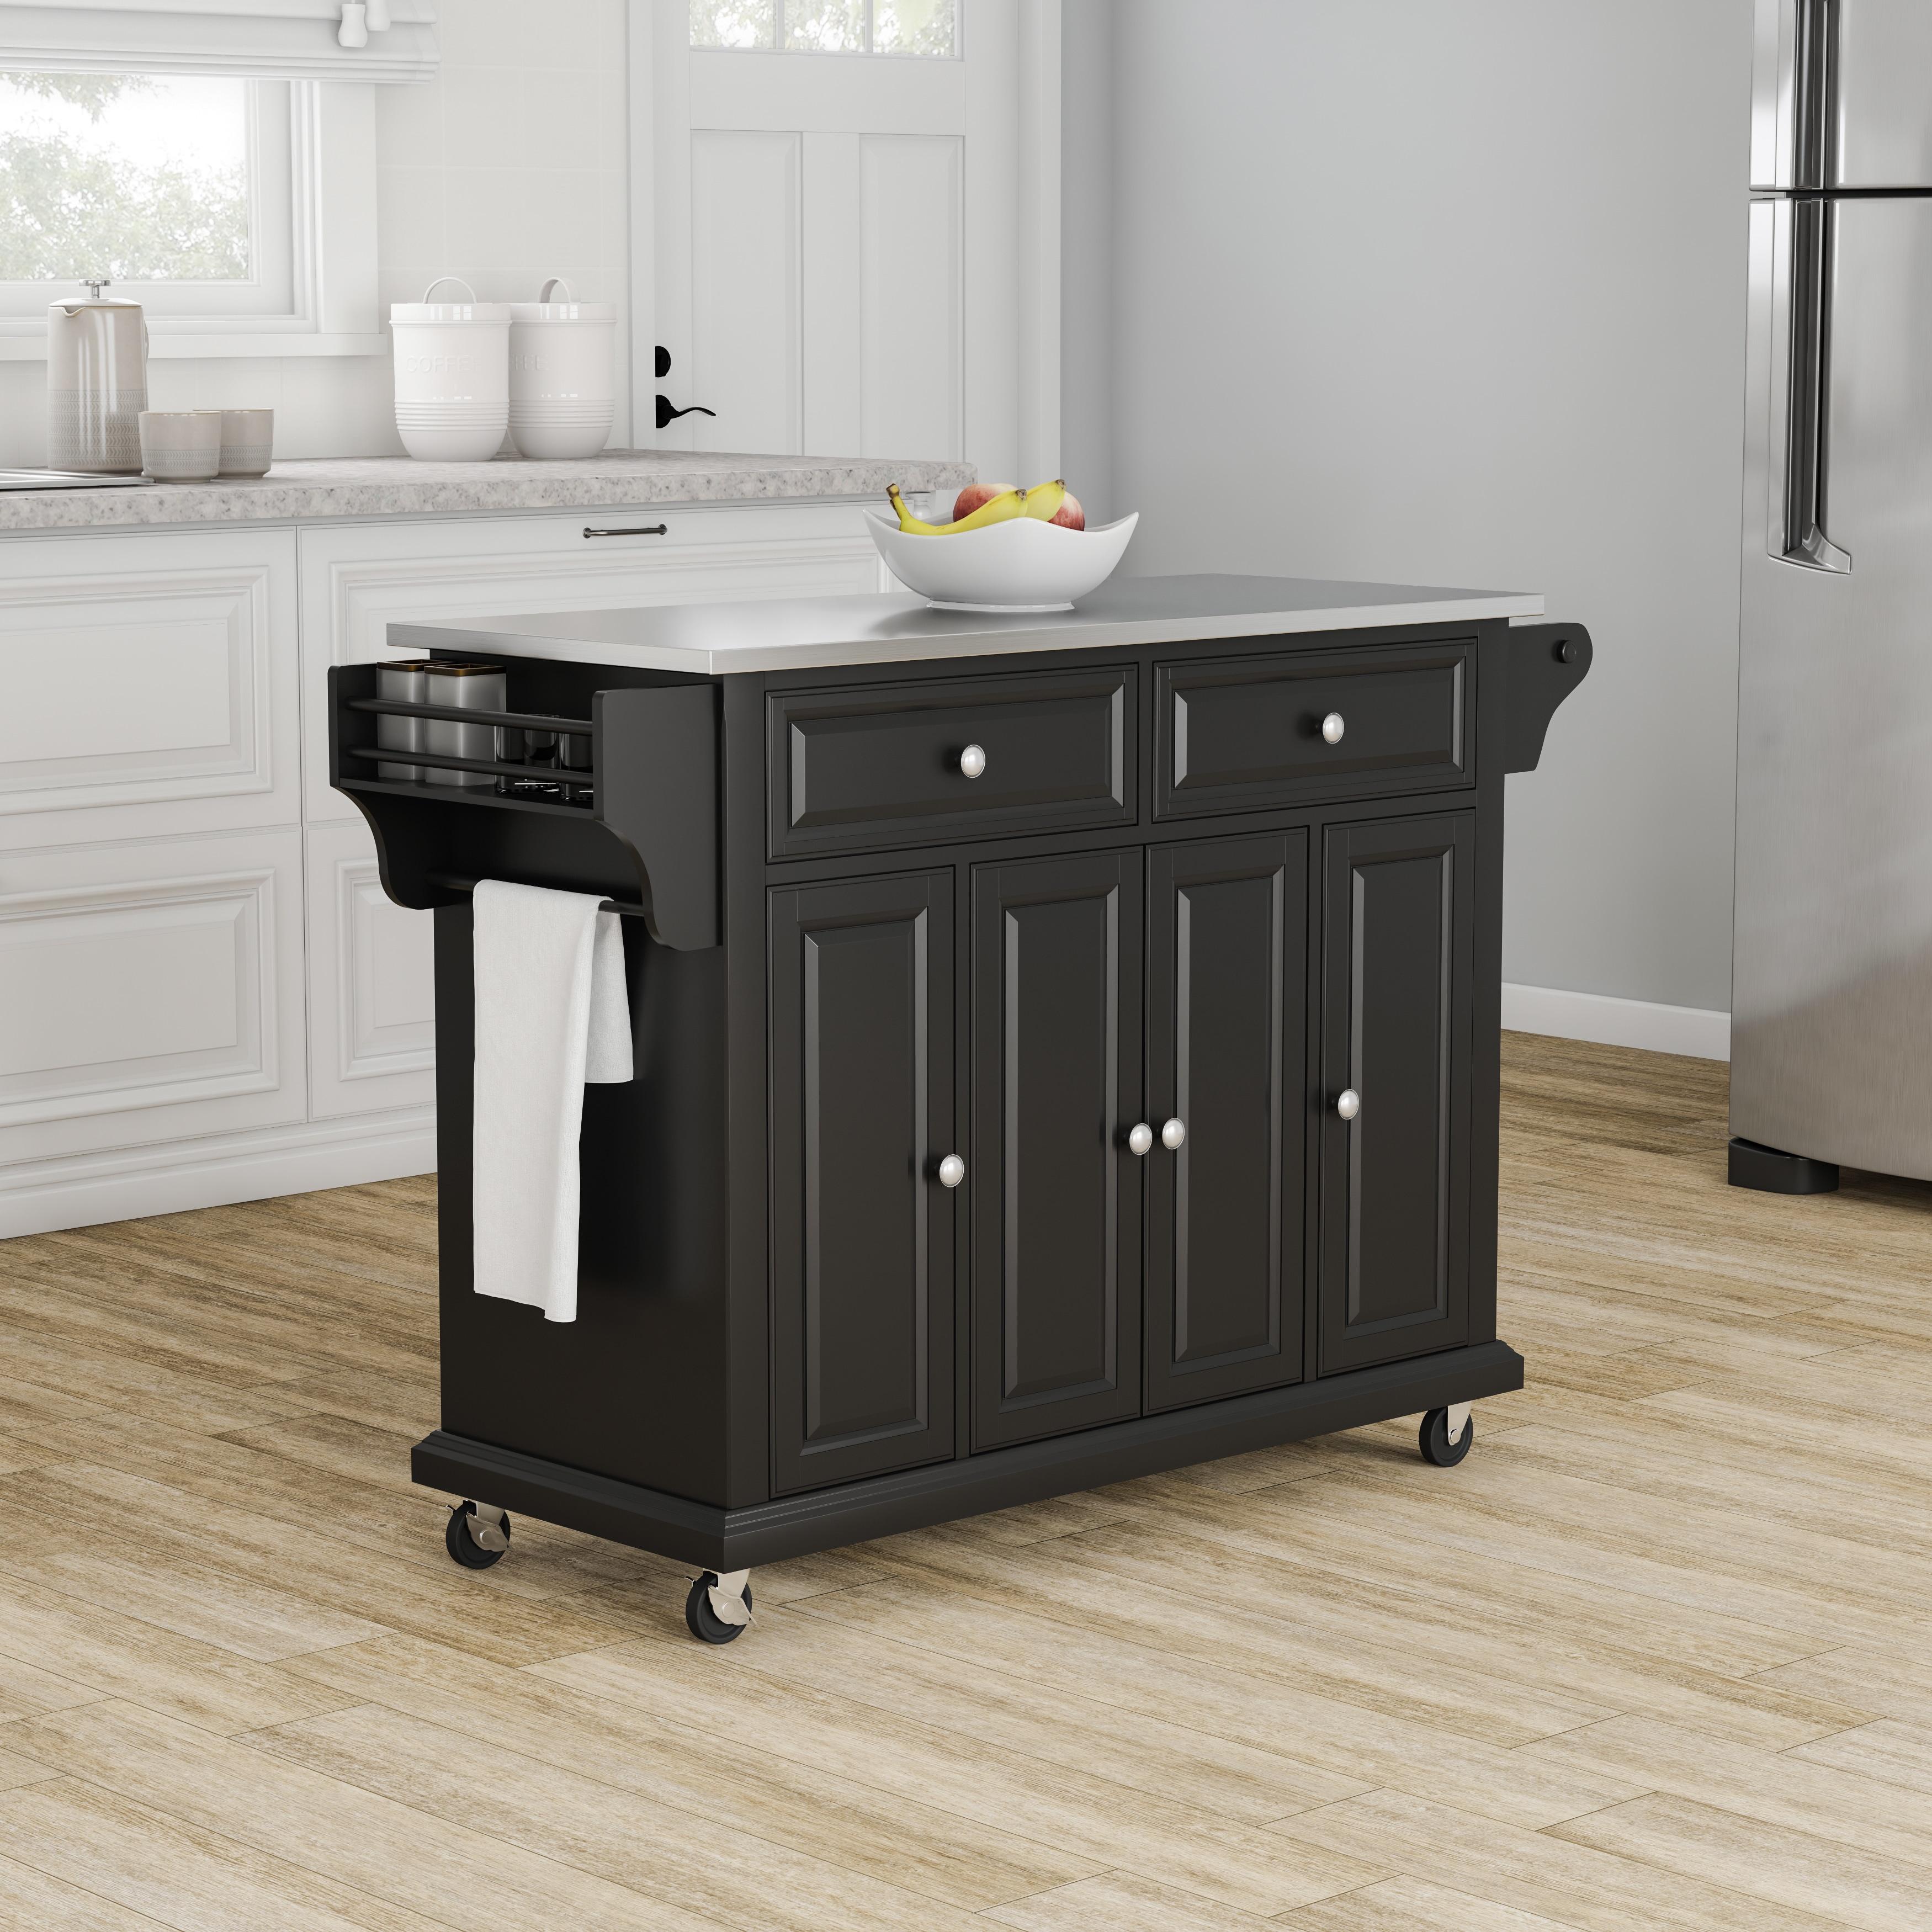 Copper Grove Kanha Black Finish Stainless Steel Top Kitchen Cart/ Island